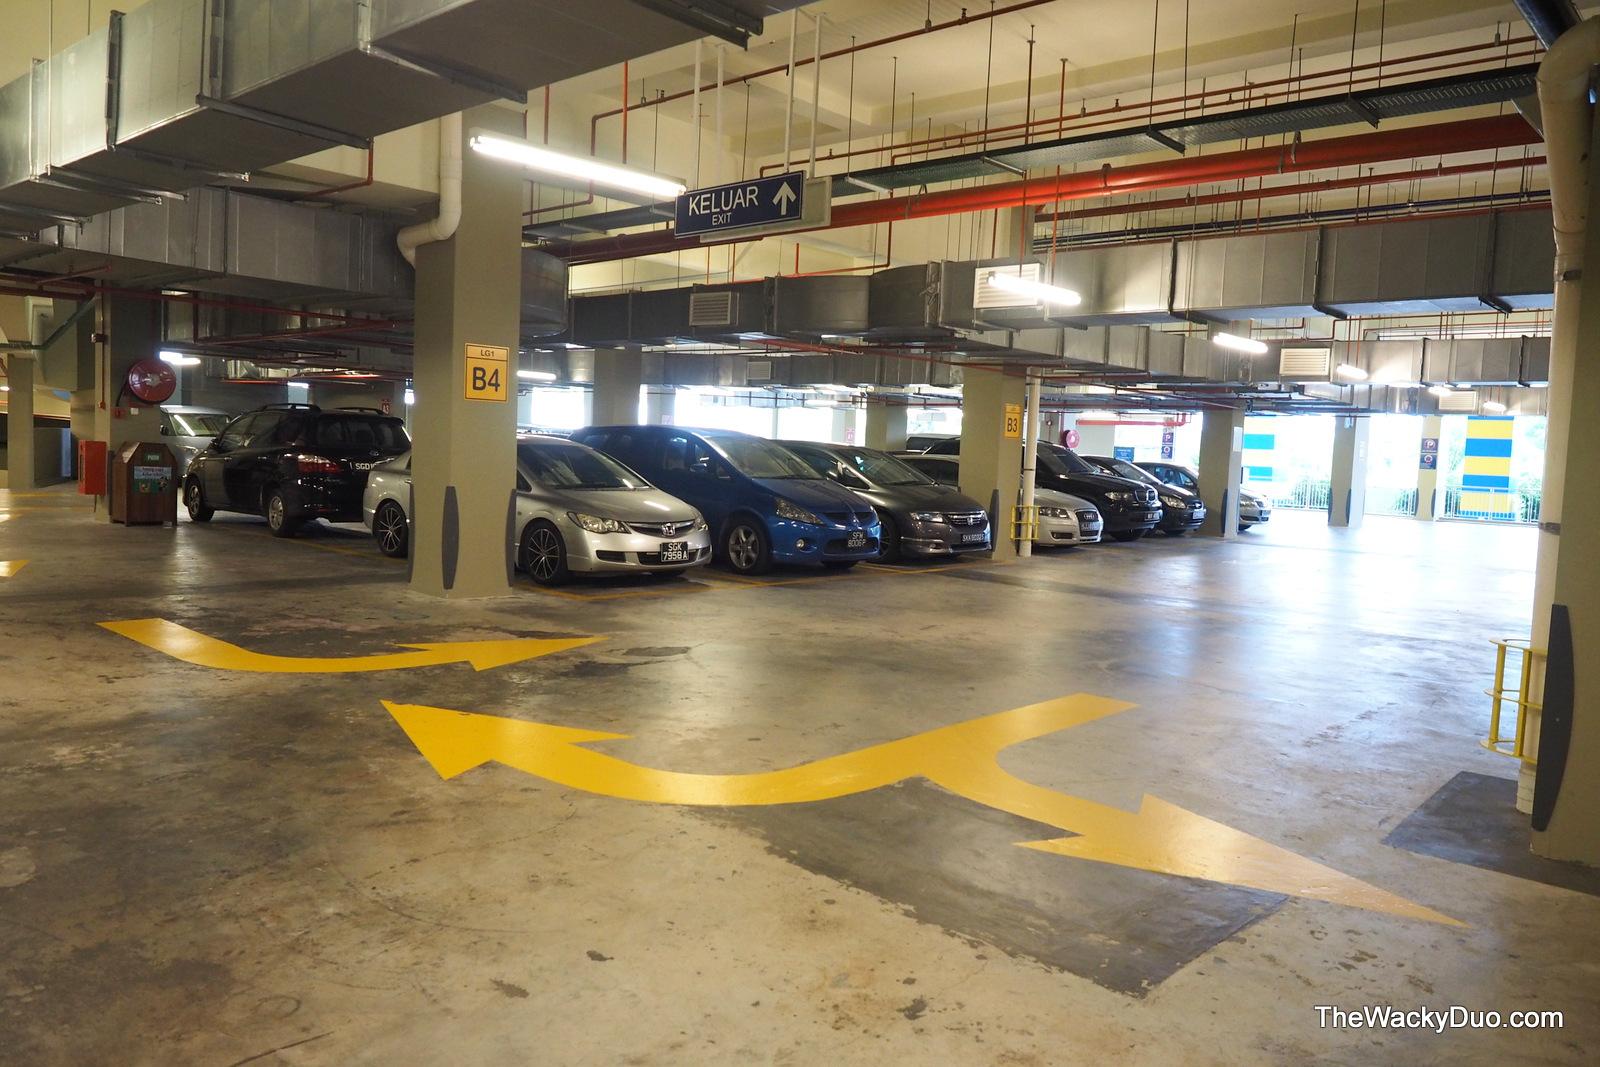 Hilton Hotel Car Park